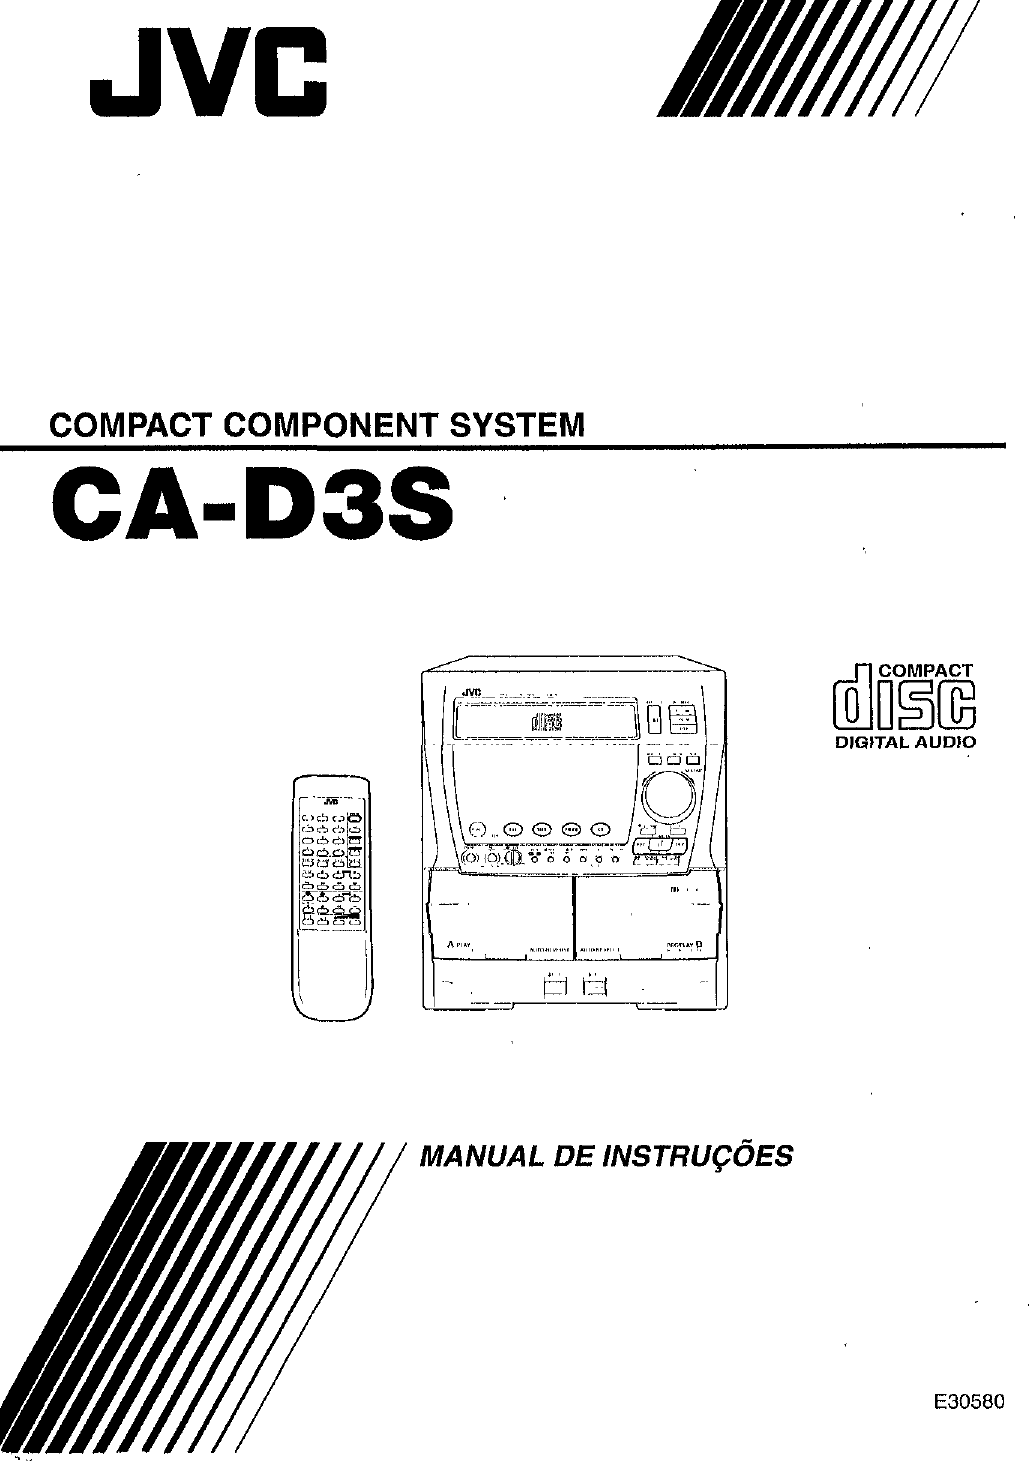 JVC CA D3S User Manual E30580